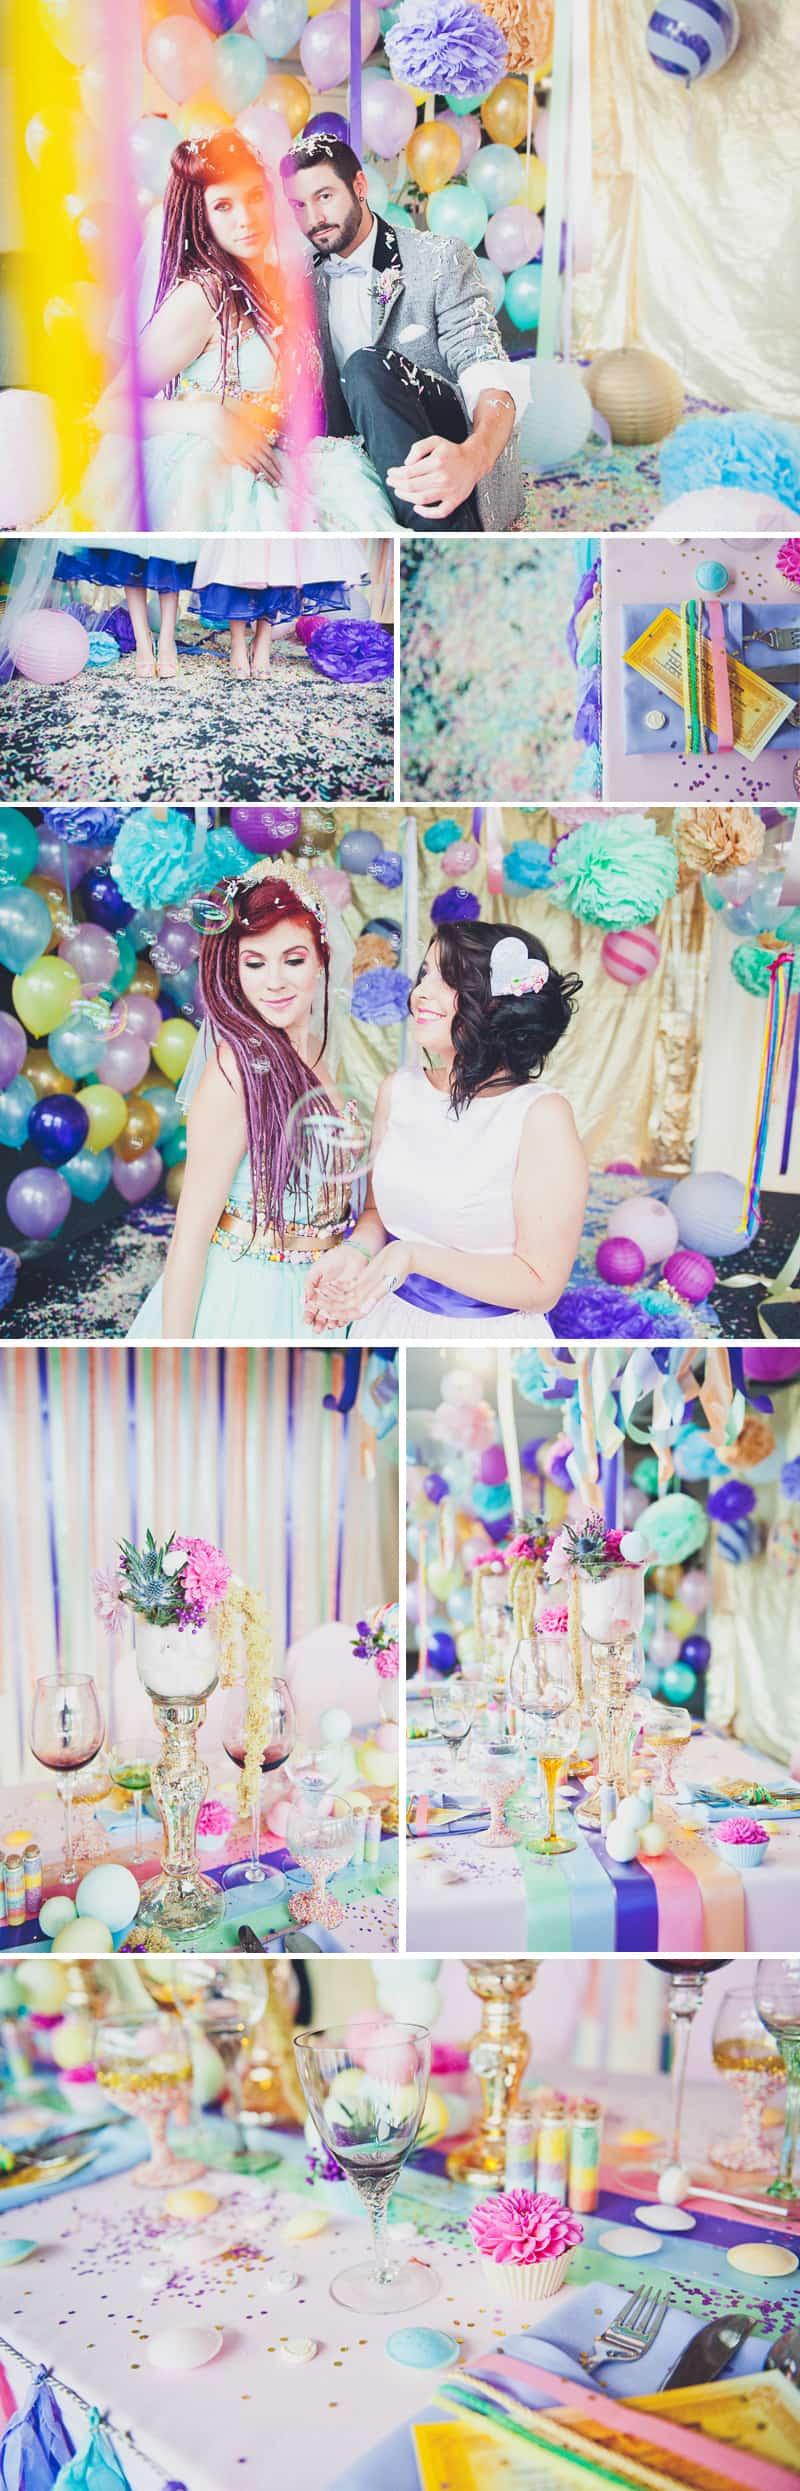 Willy Wonka Weird Wonderful Wedding World 4